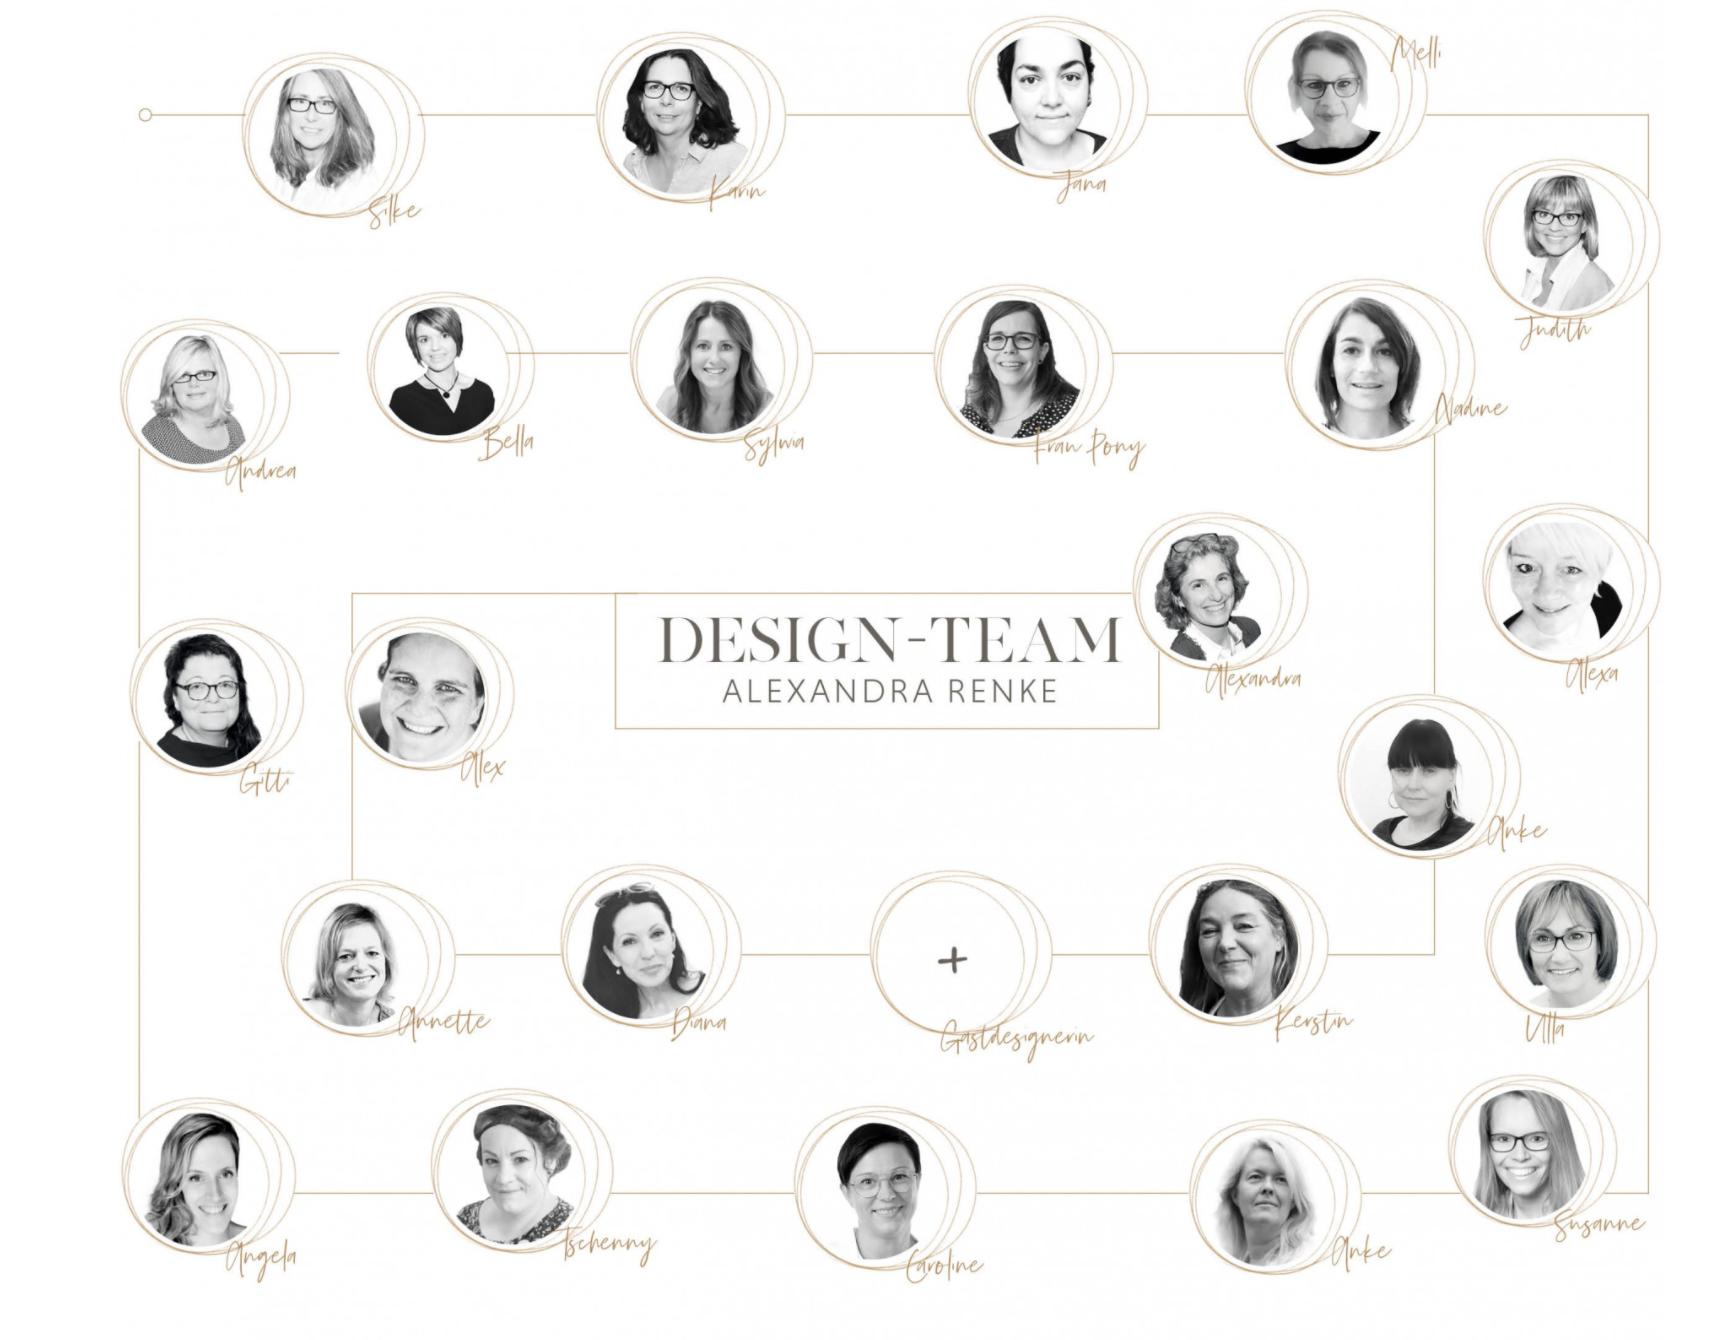 designteam alexandra renke 2021